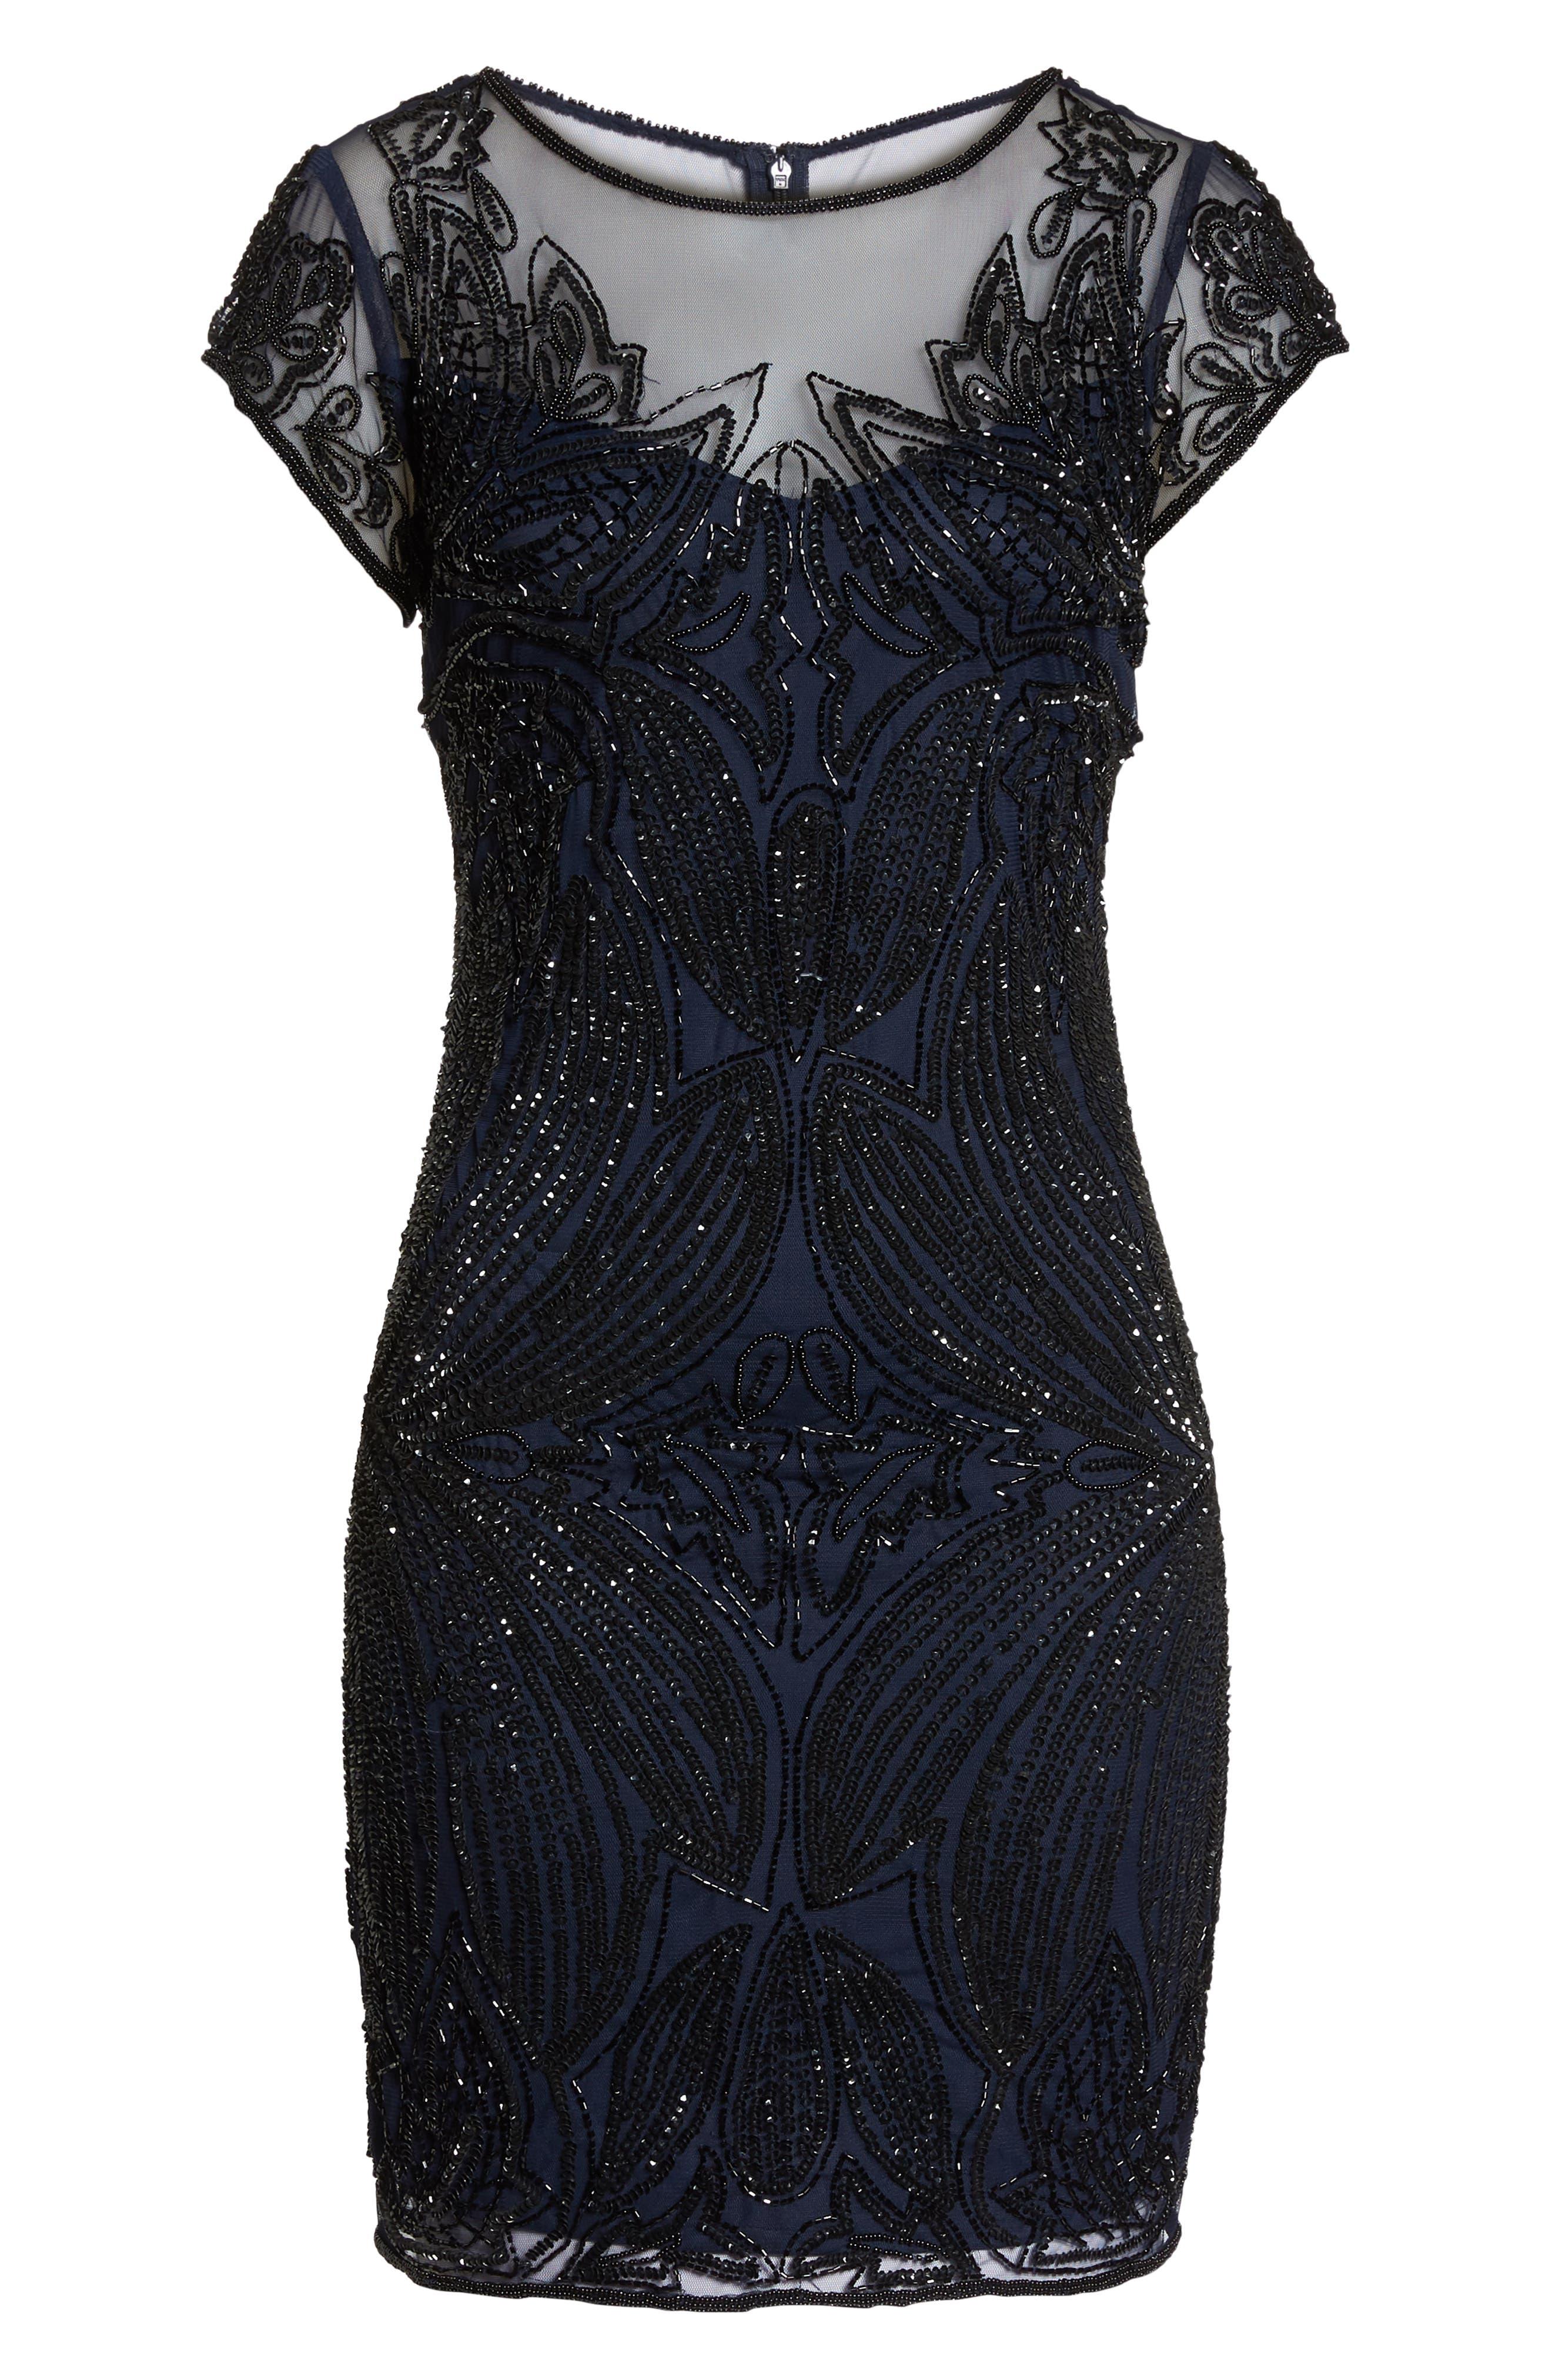 Beaded Illusion Yoke Sheath Dress,                             Alternate thumbnail 7, color,                             Navy Black